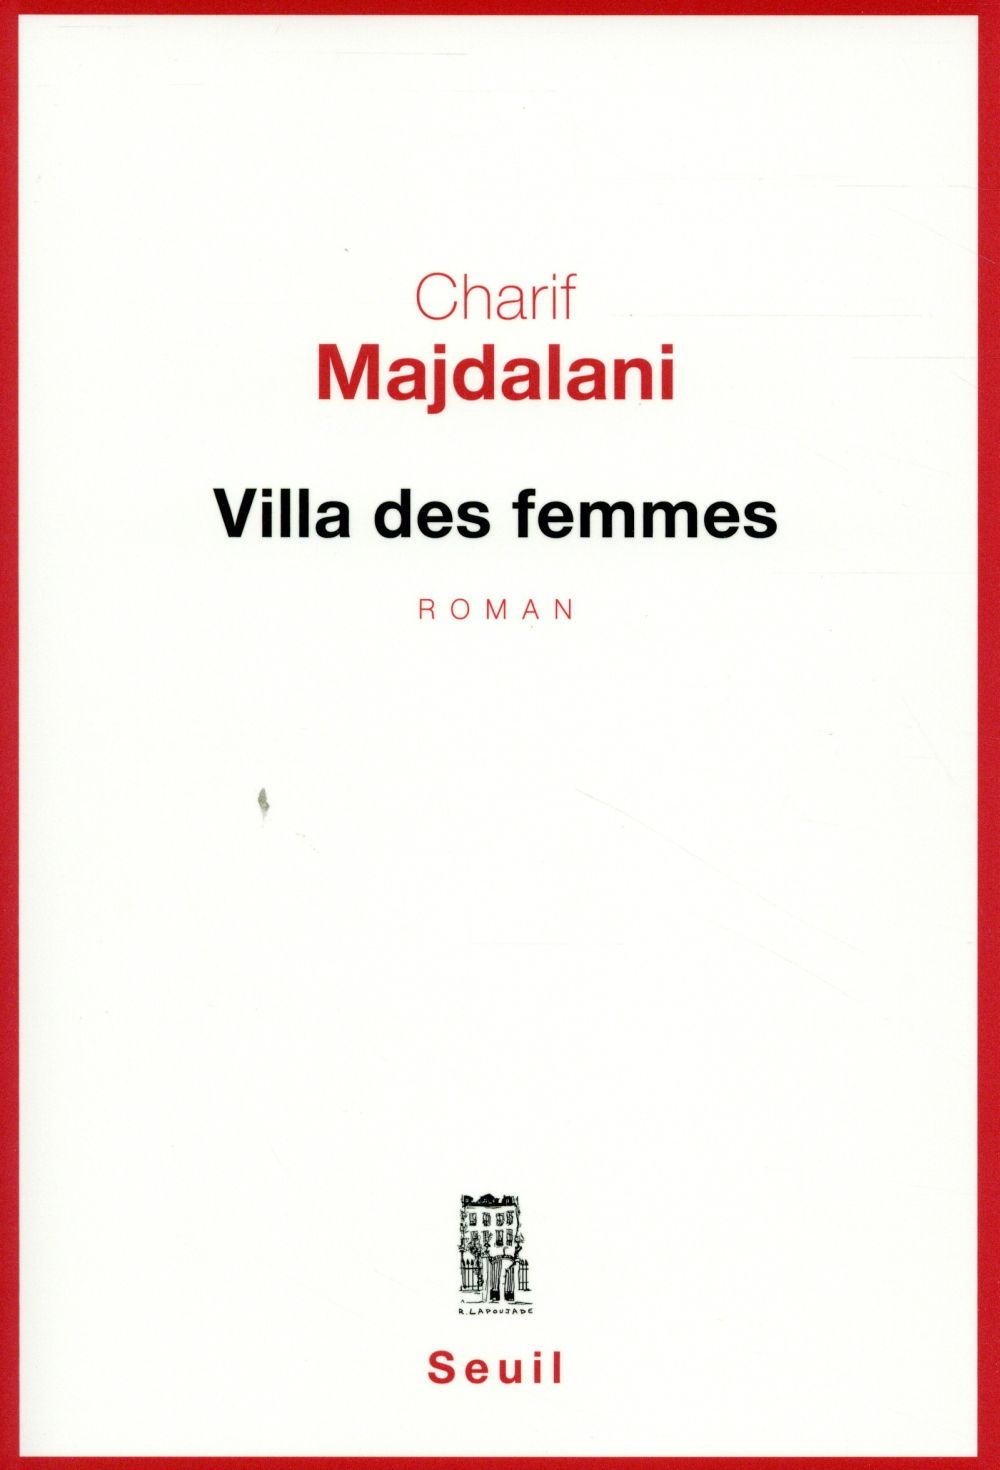 VILLA DES FEMMES